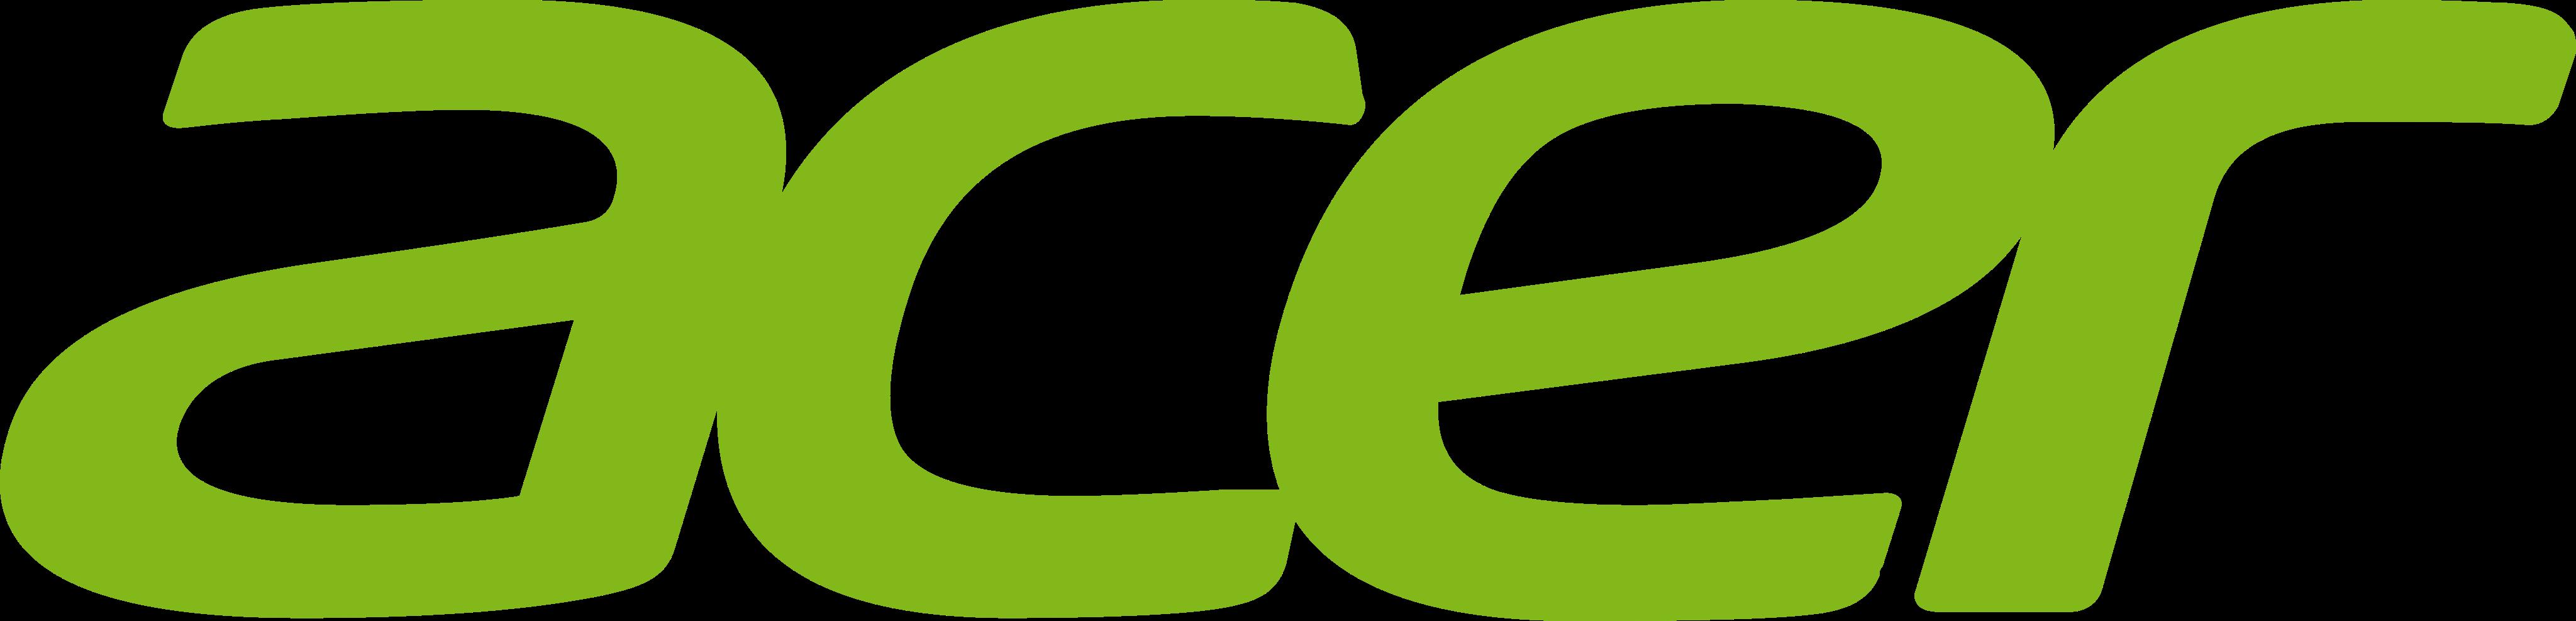 acer logo 1 - Acer Logo